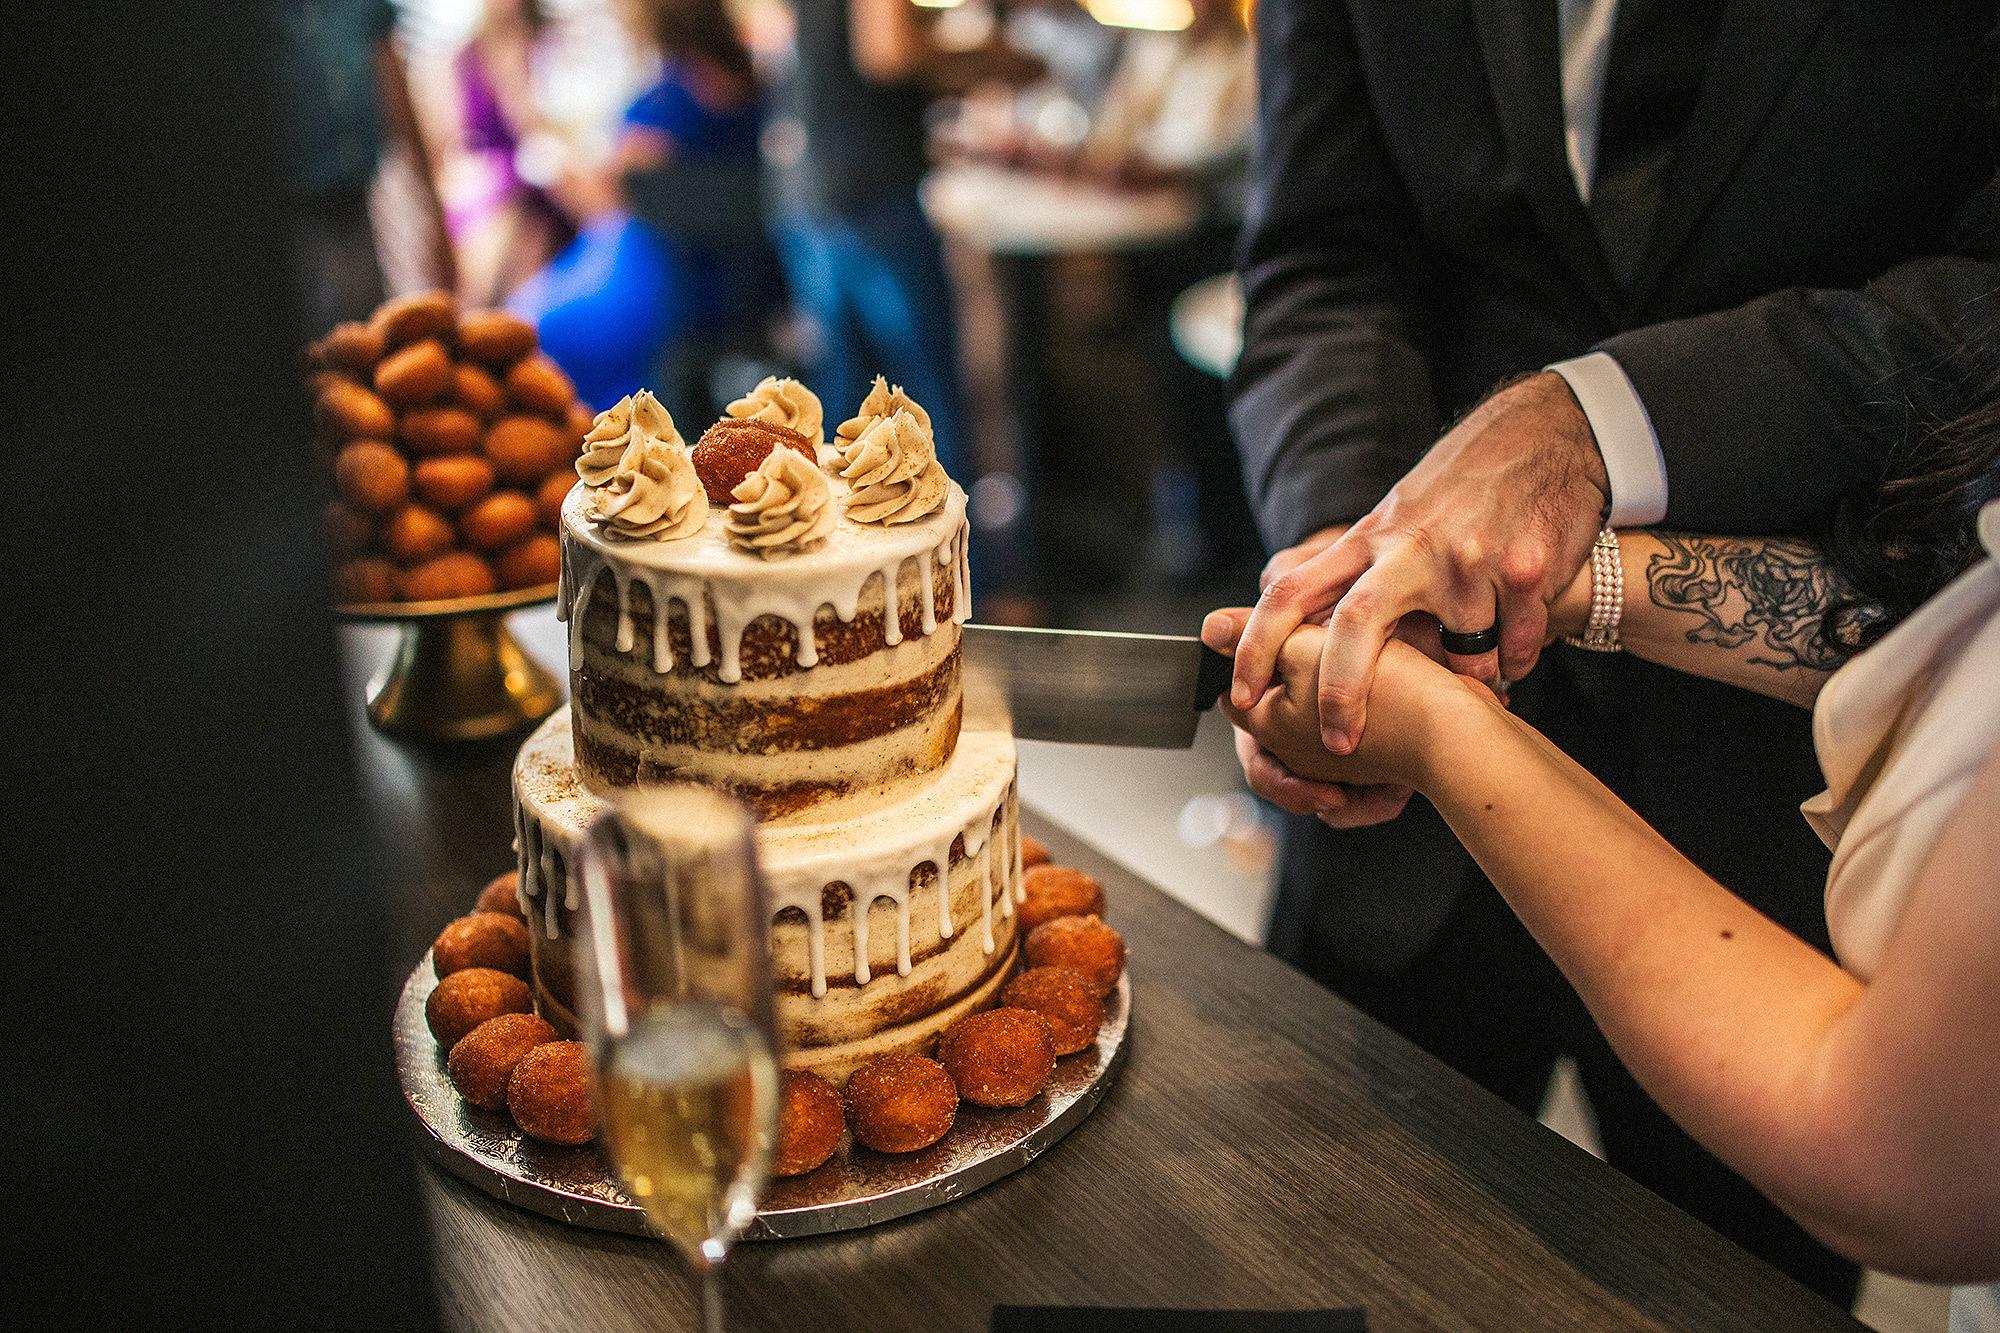 Свадебный торт молодоженов. Фото: people.com